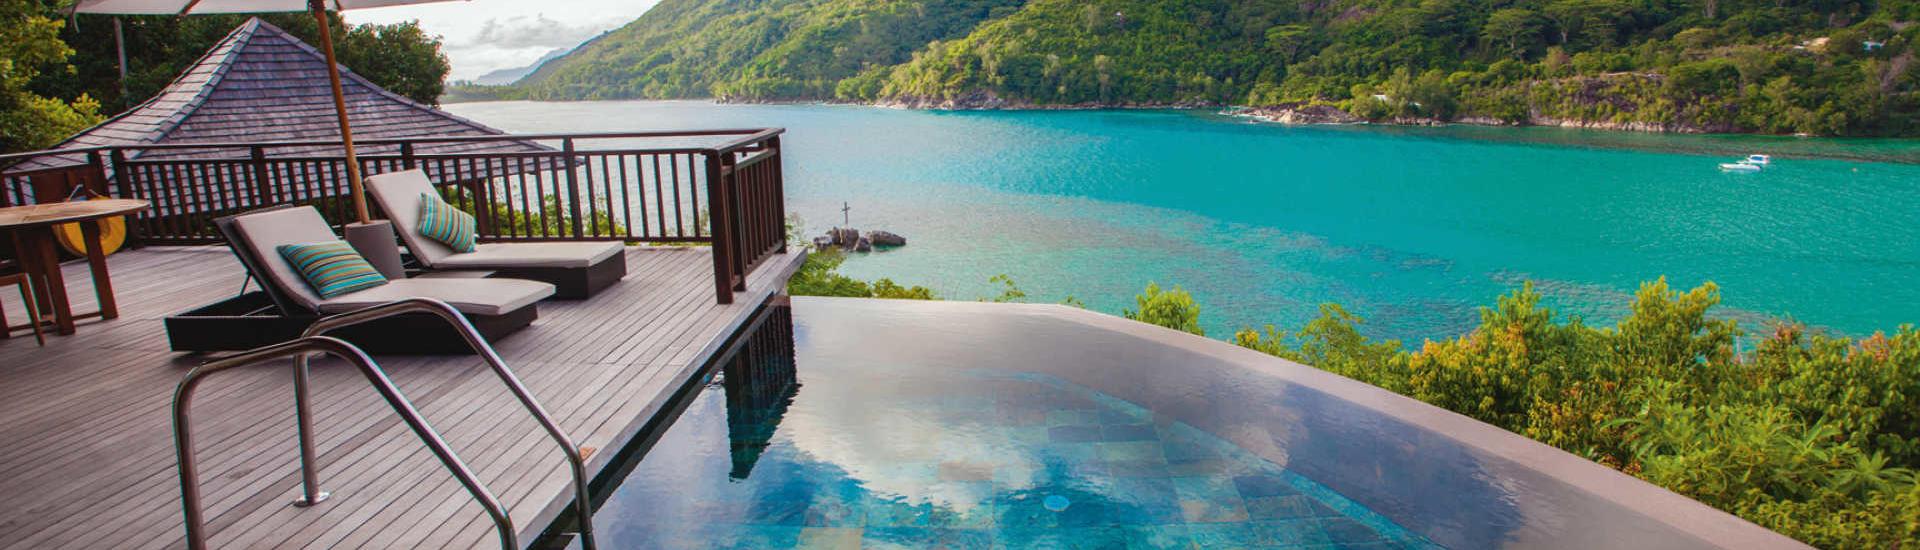 Seychelles - Twin Center